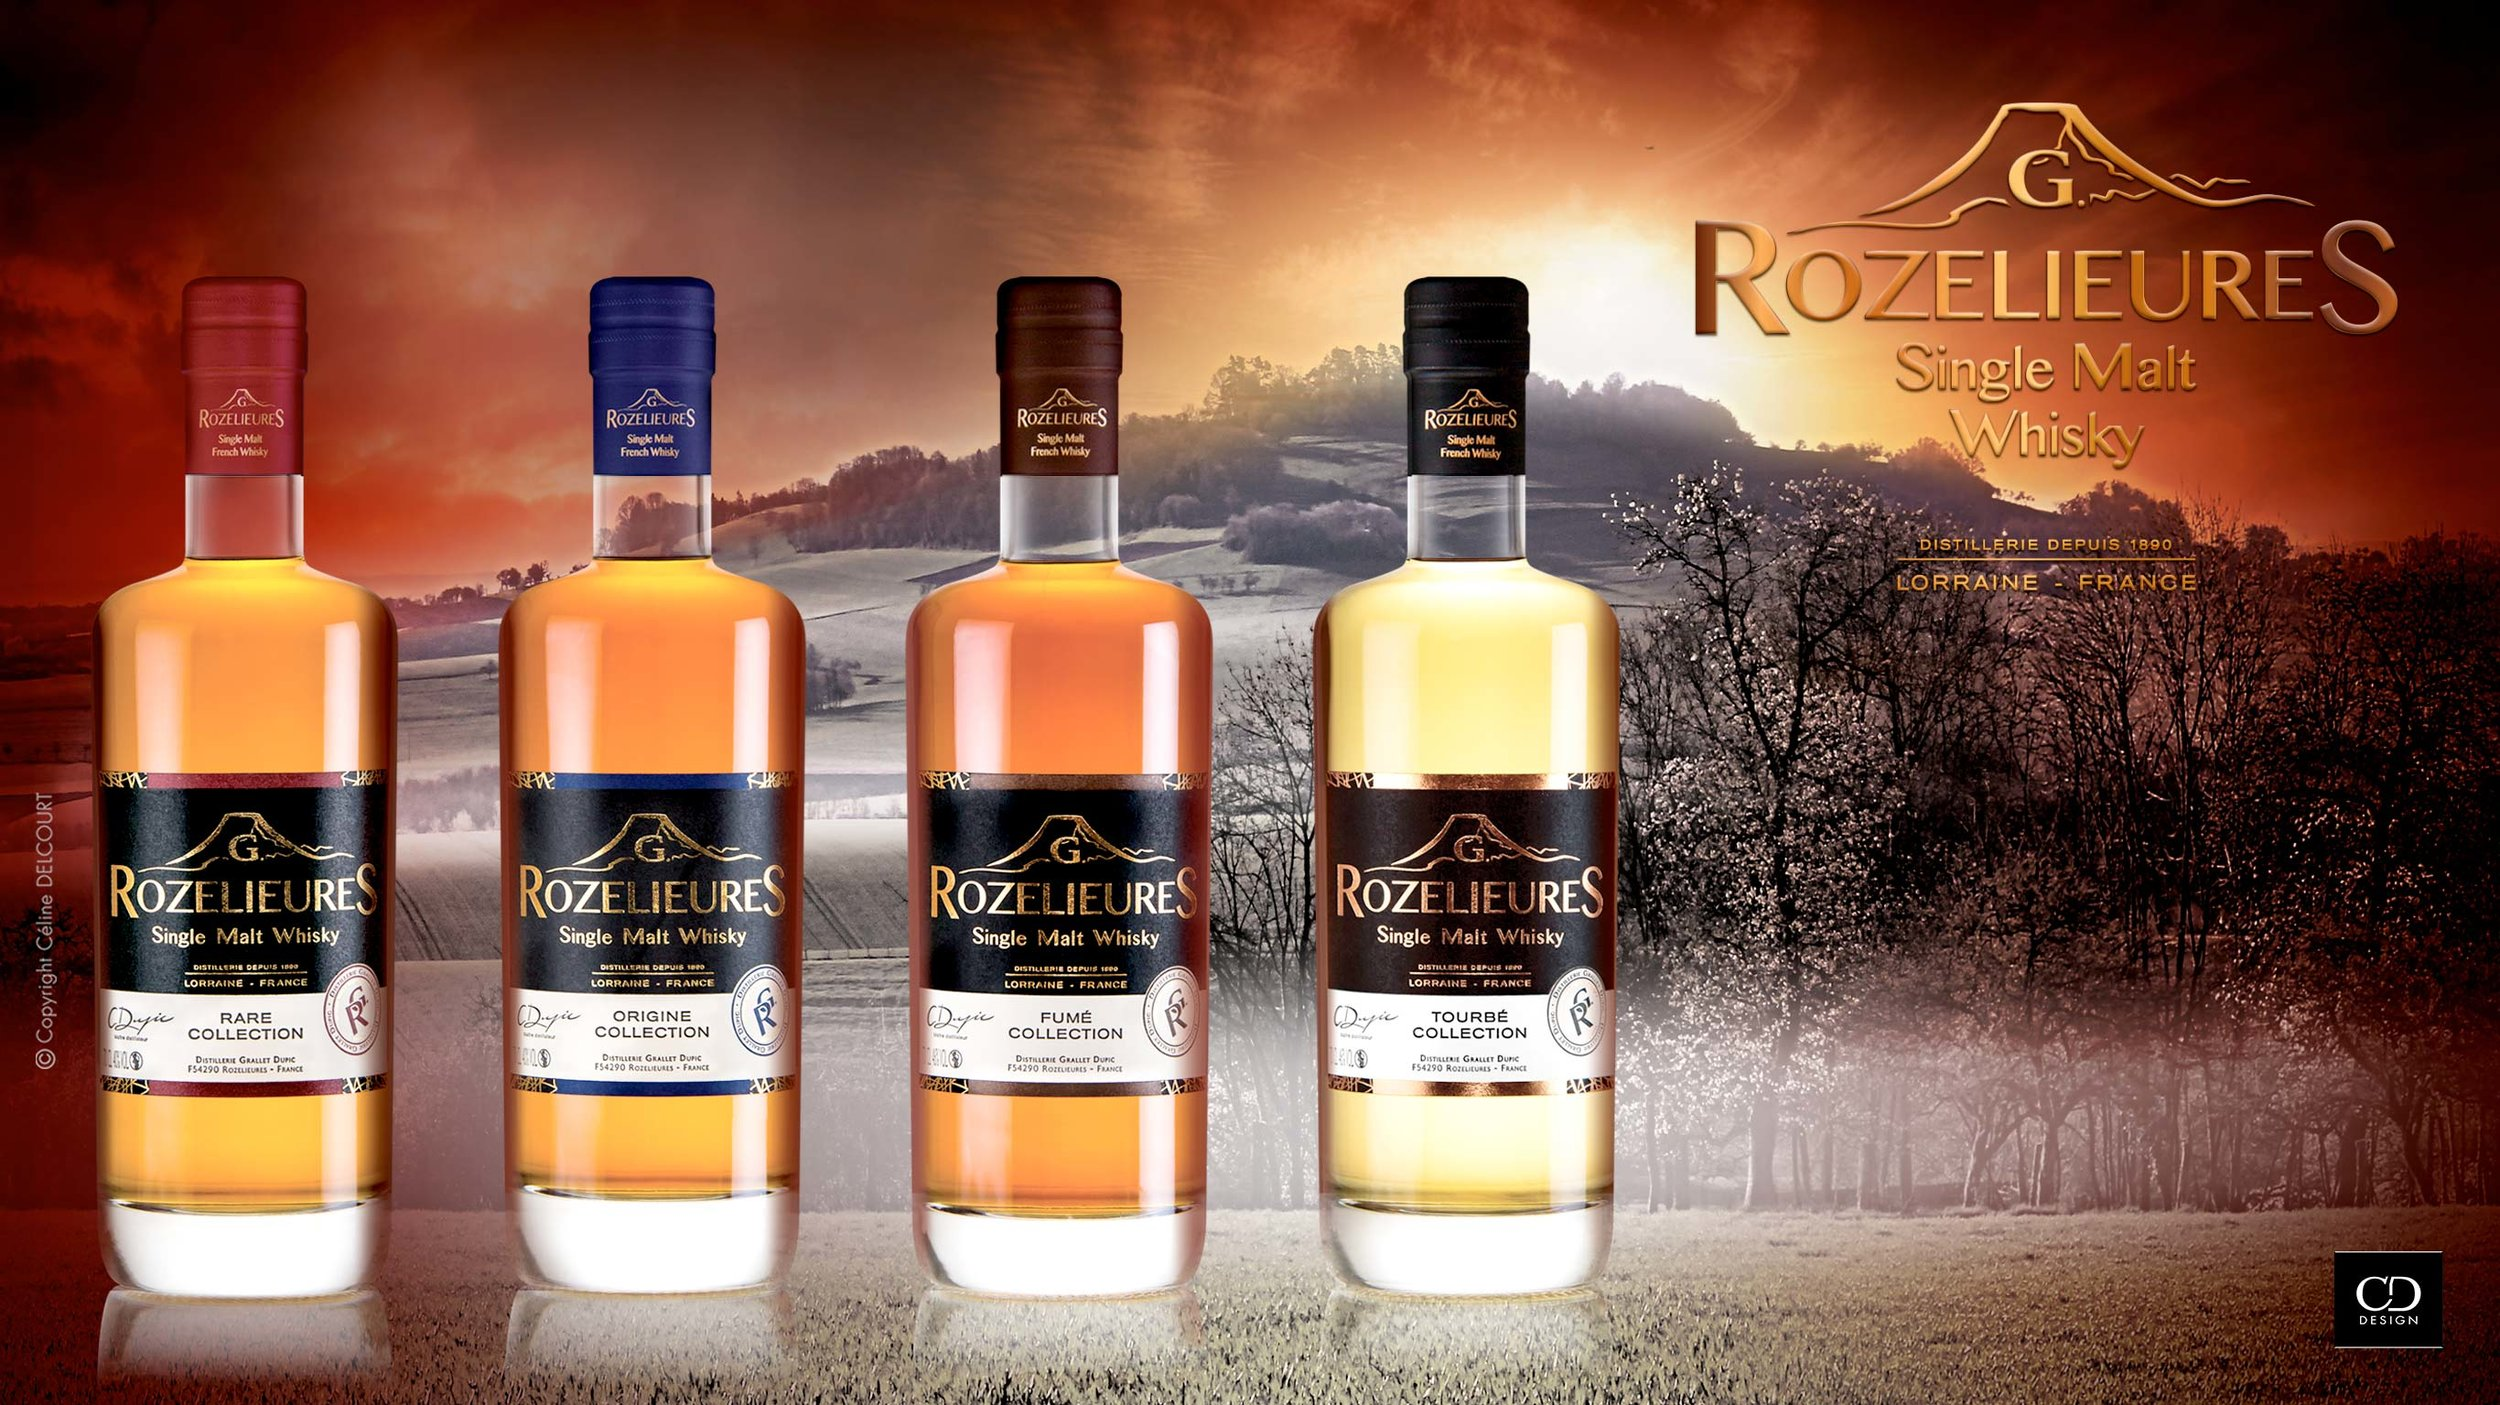 CDDESIGN.G.ROZELIEURES.whisky.jpg